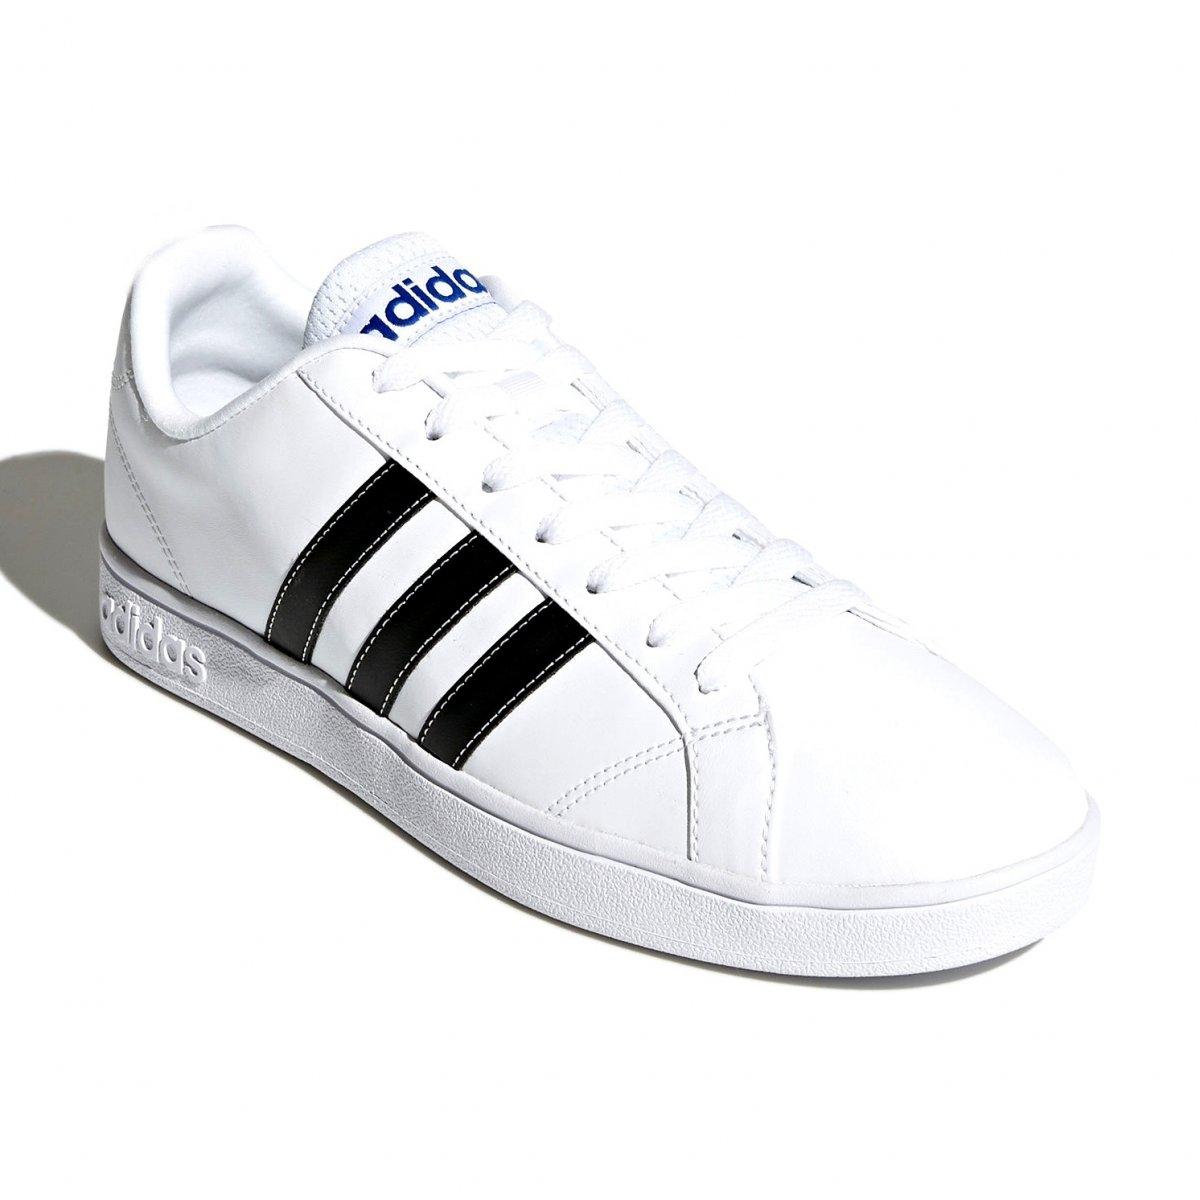 204d6b2d83f Tênis Masculino Adidas VS Advantage F99256 - Branco Preto - Calçados ...